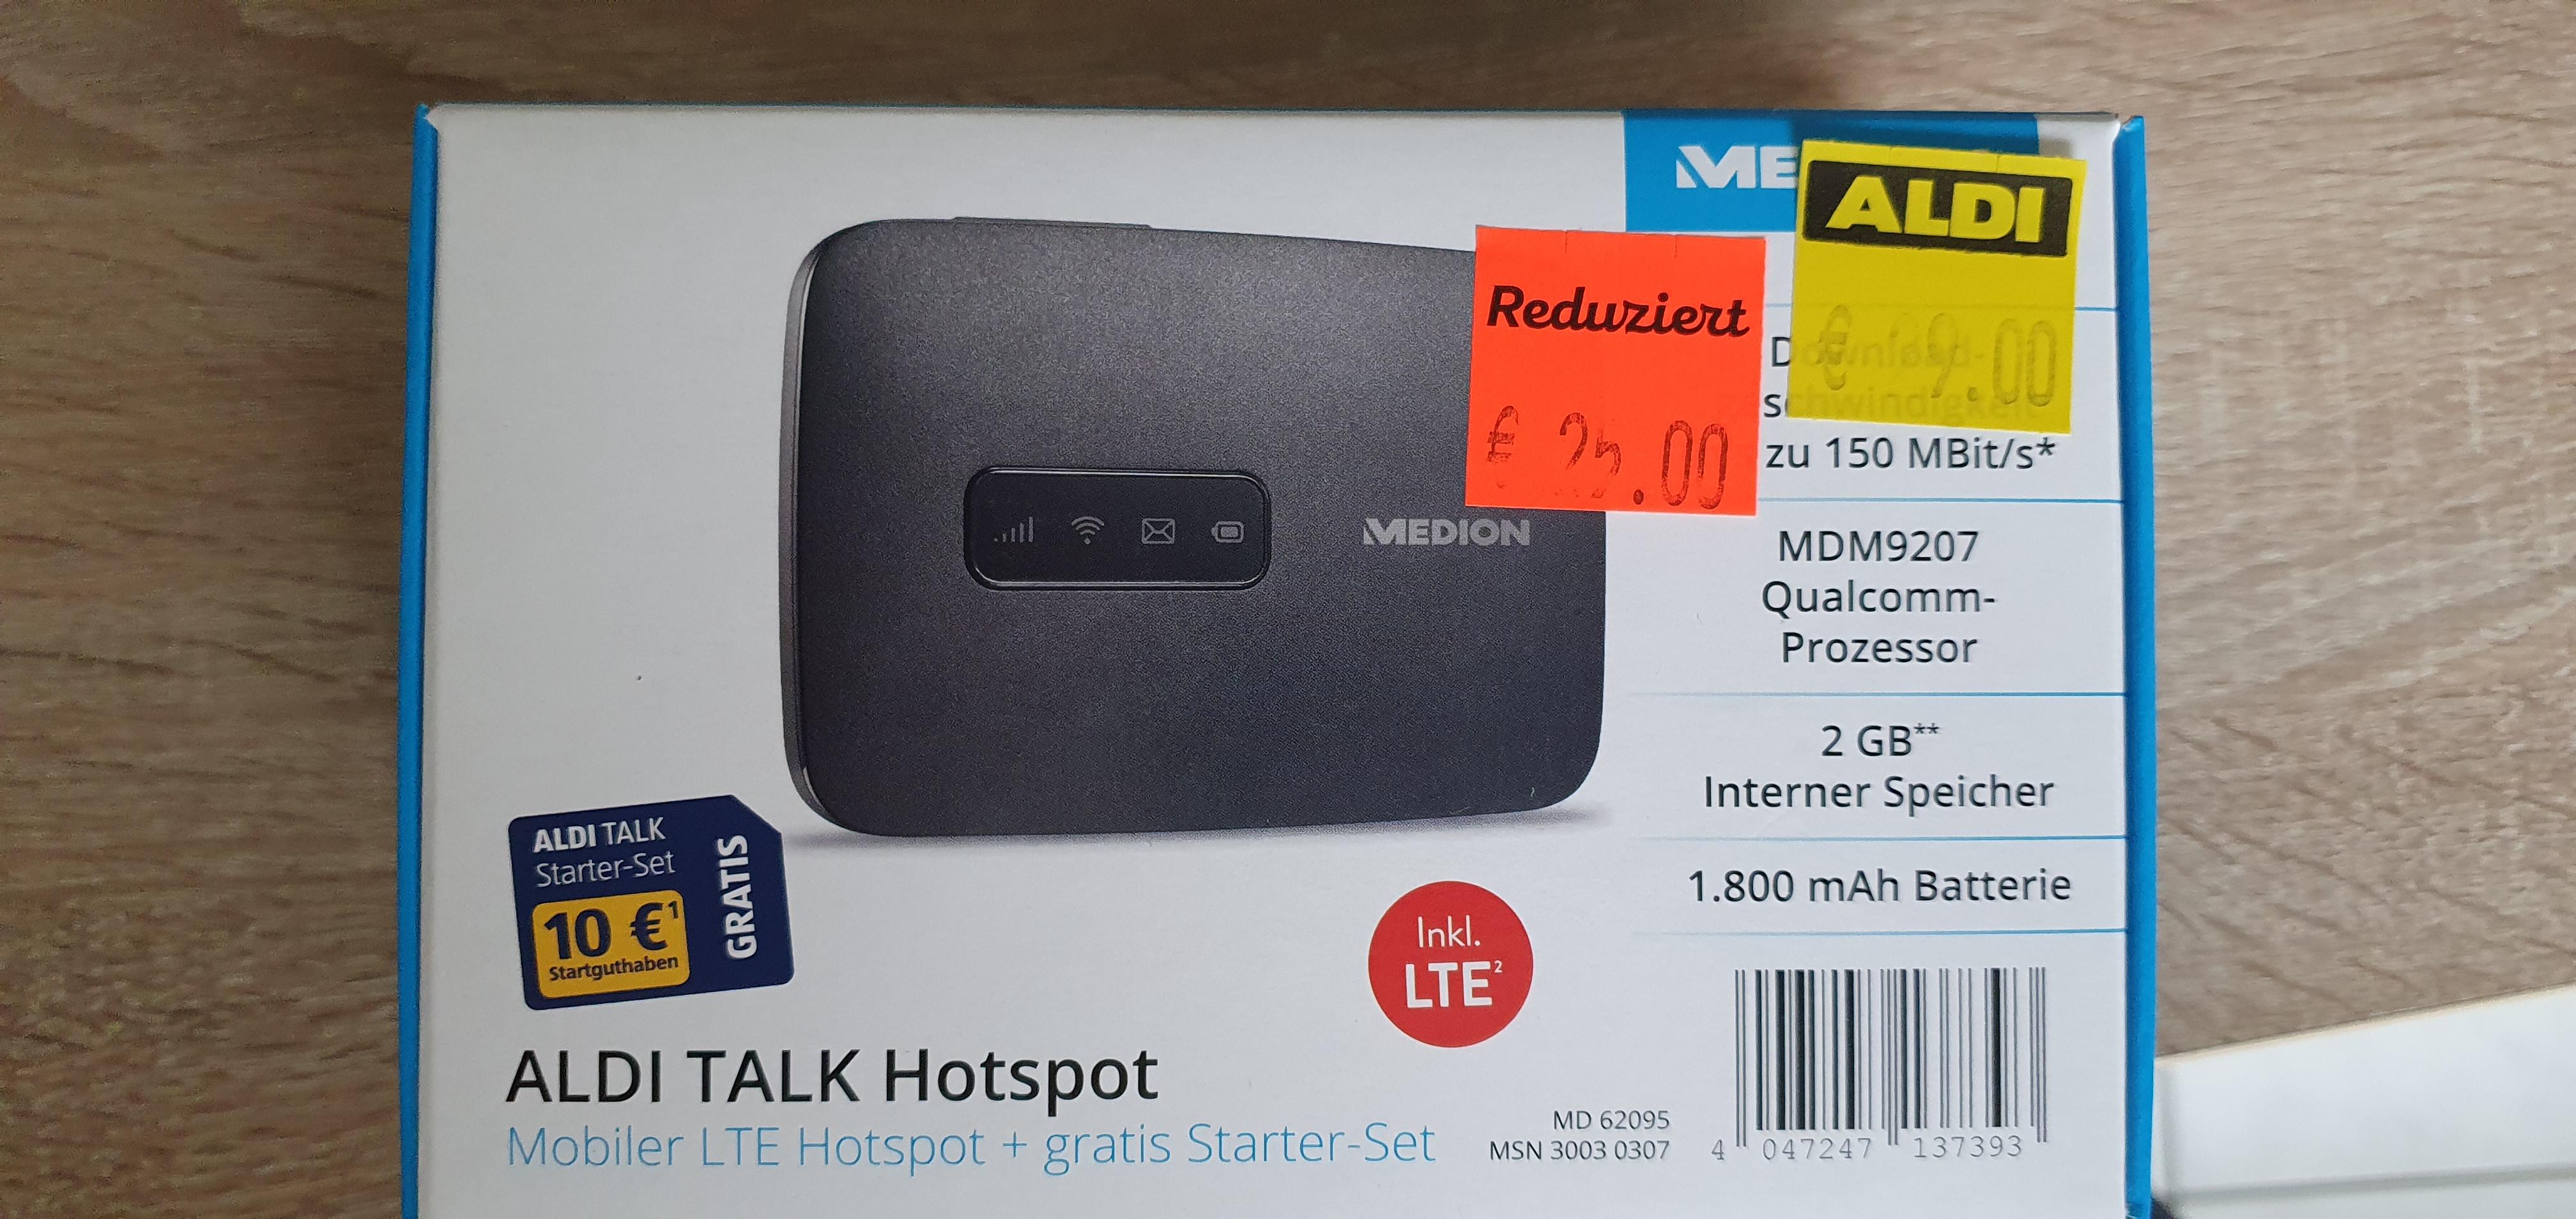 (Lokal Aldi Höxter) Mobiler LTE-Hotspot MD62095 incl. 10,- Aldi Talk Starter-Set